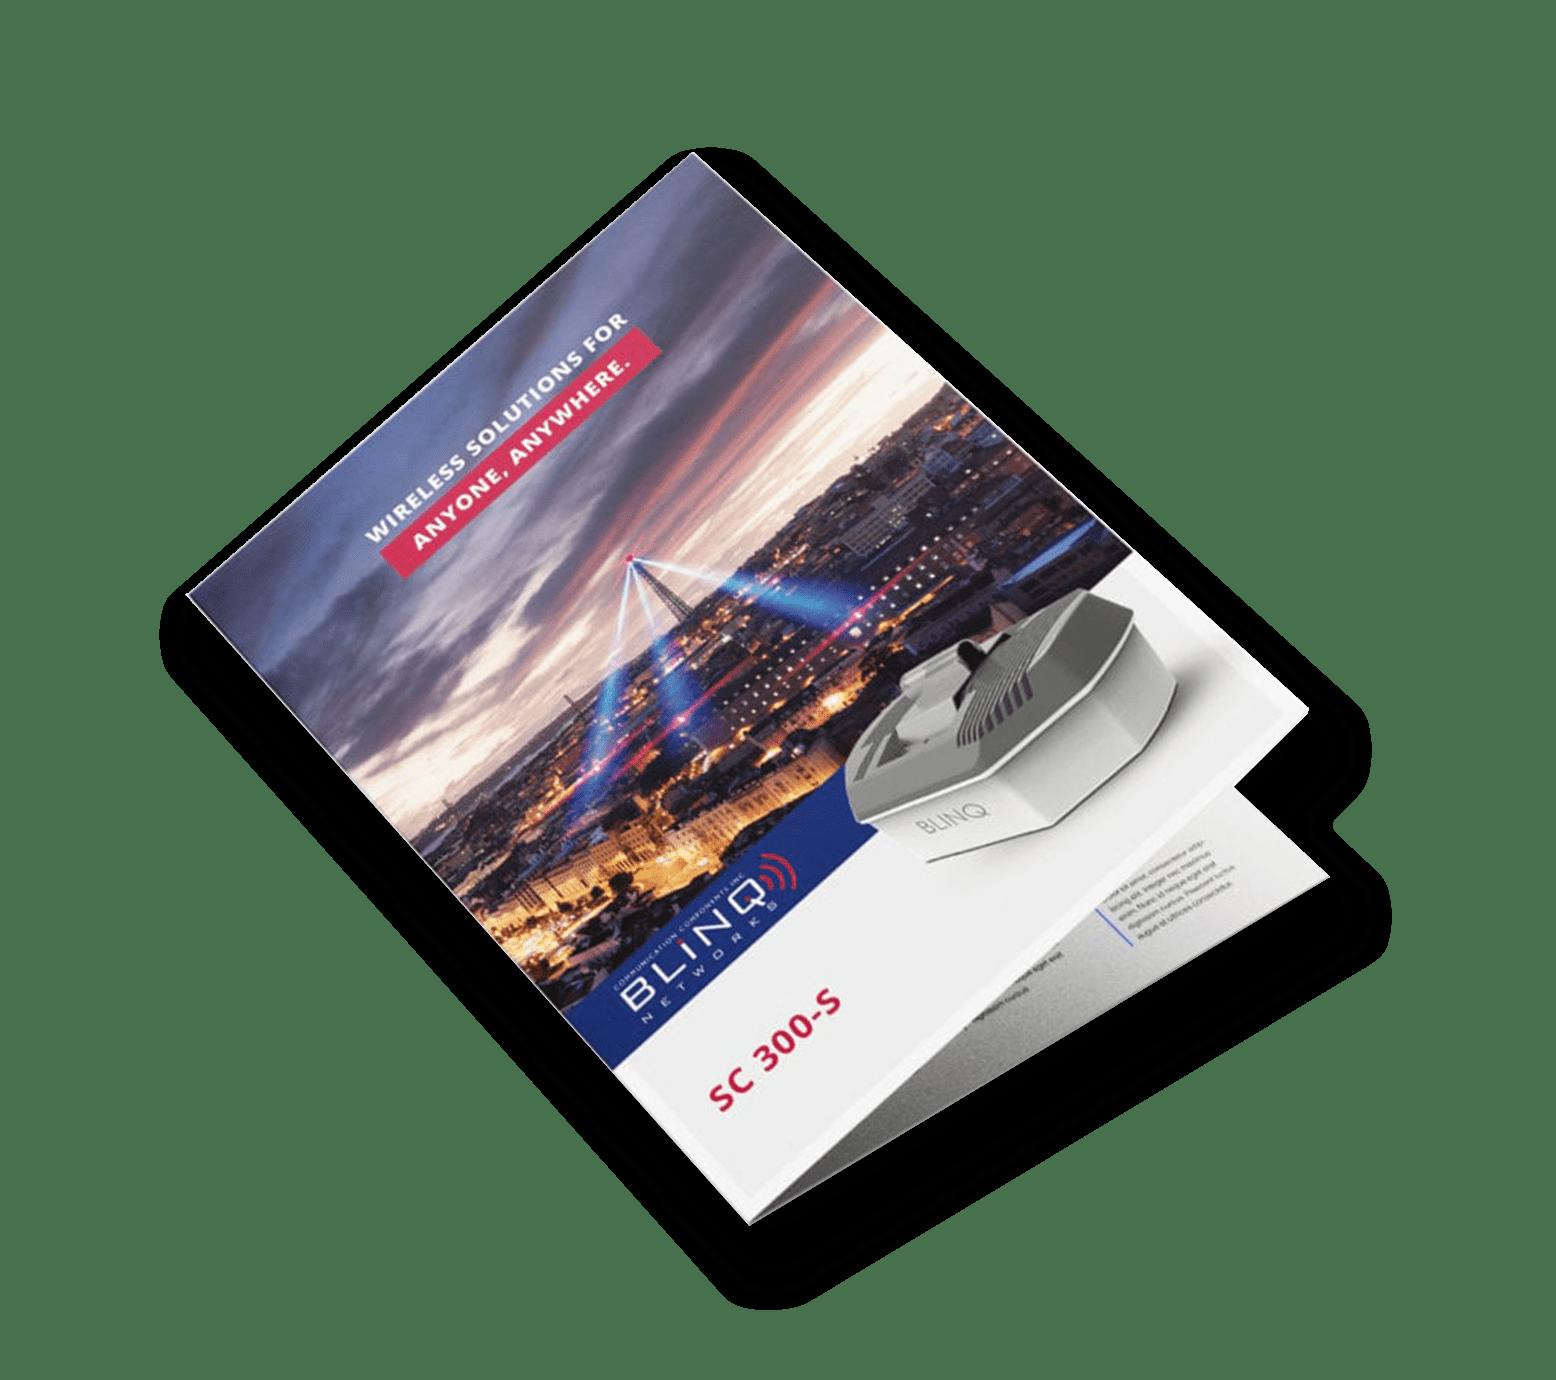 blinq networks sc300s base station specification sheet brochure